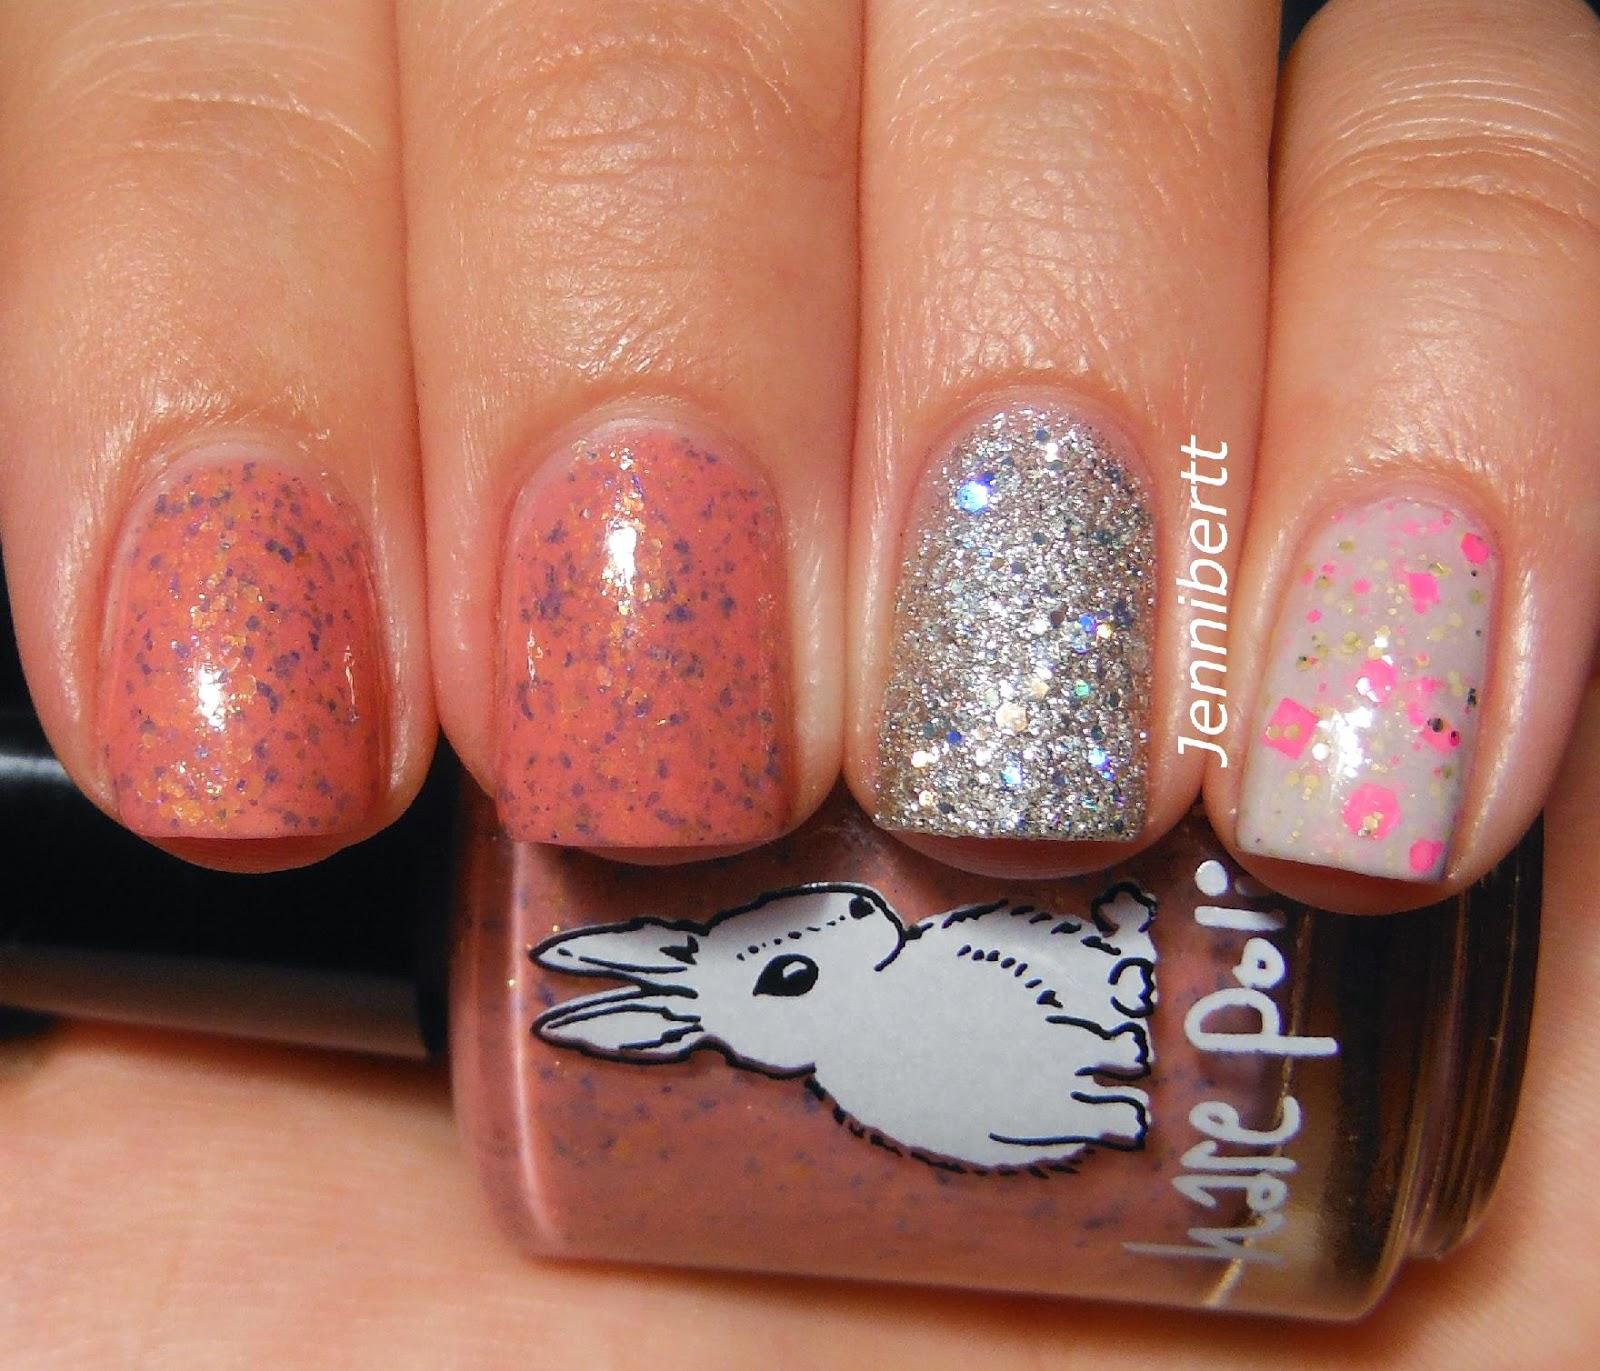 Es Nail Los Angeles: Jennibertt's Nails: Simple Swatch(es)- Hare Polish And Zoya